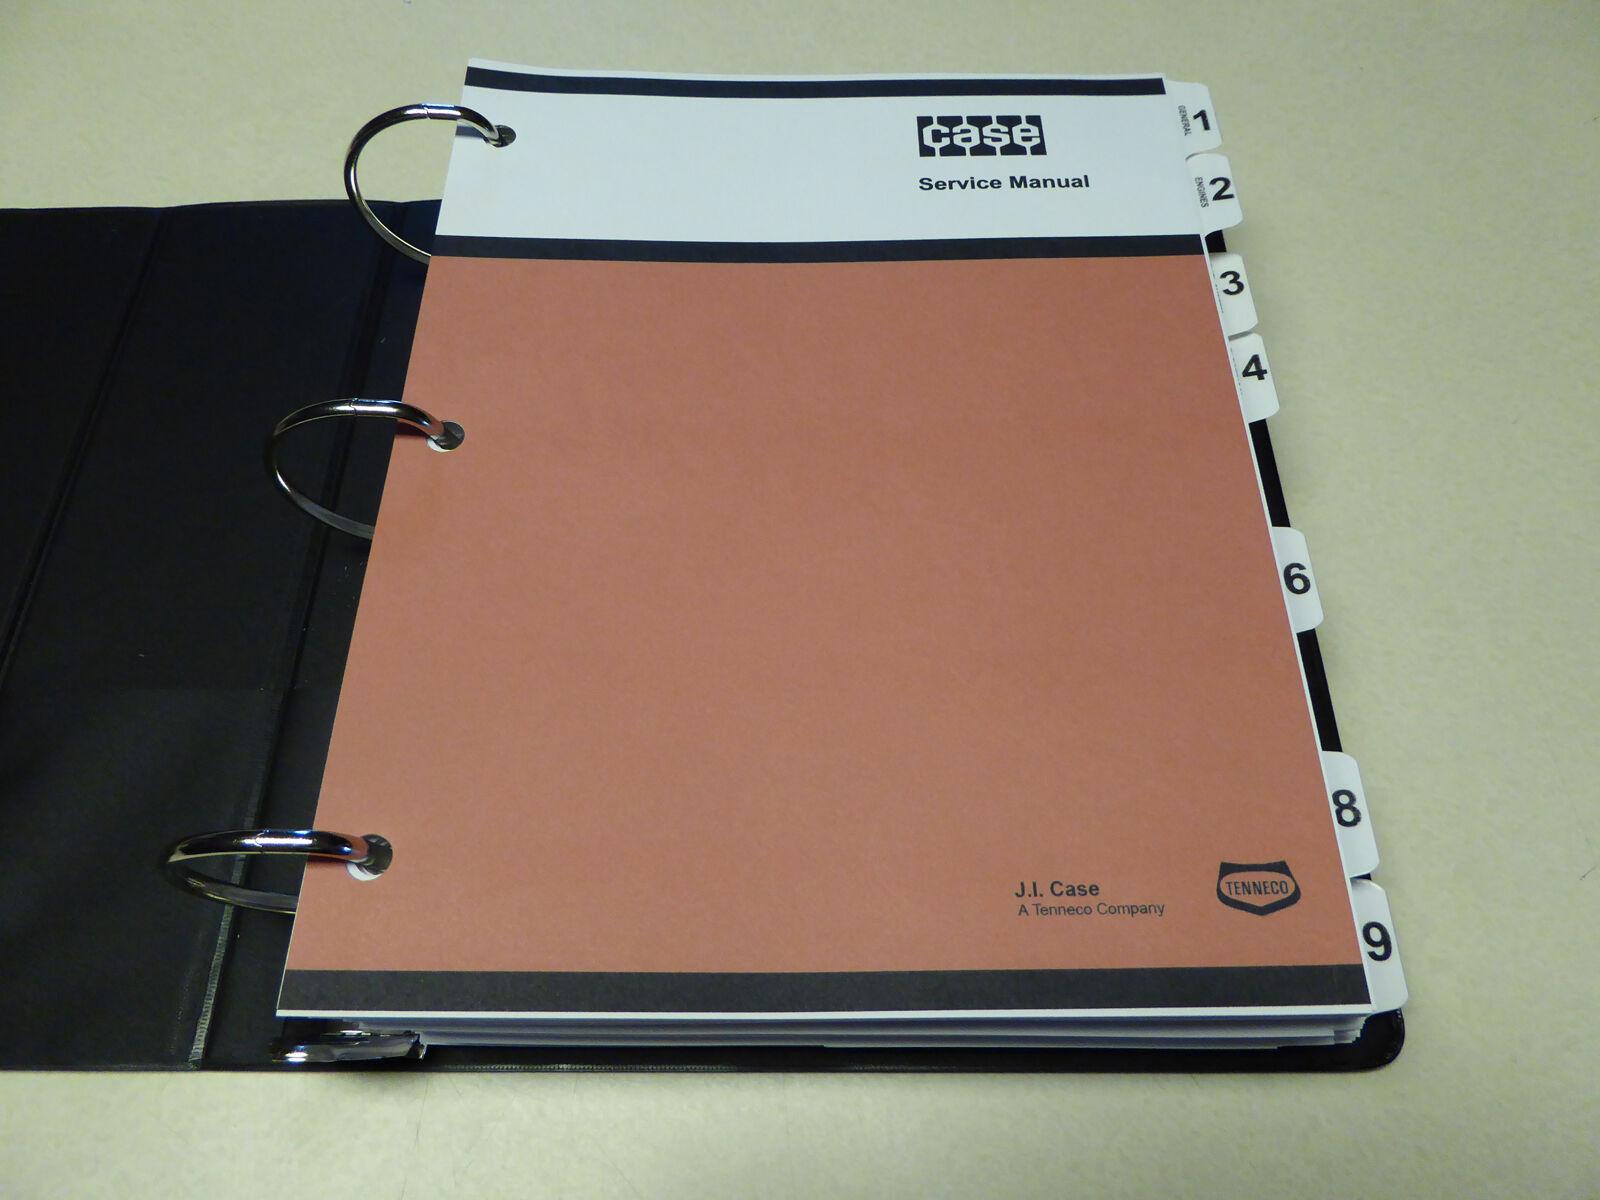 2 of 12 Case 1845C Uni-Loader Skid Steer Service Manual Repair Shop Book  NEW w/Binder 3 of 12 Case ...